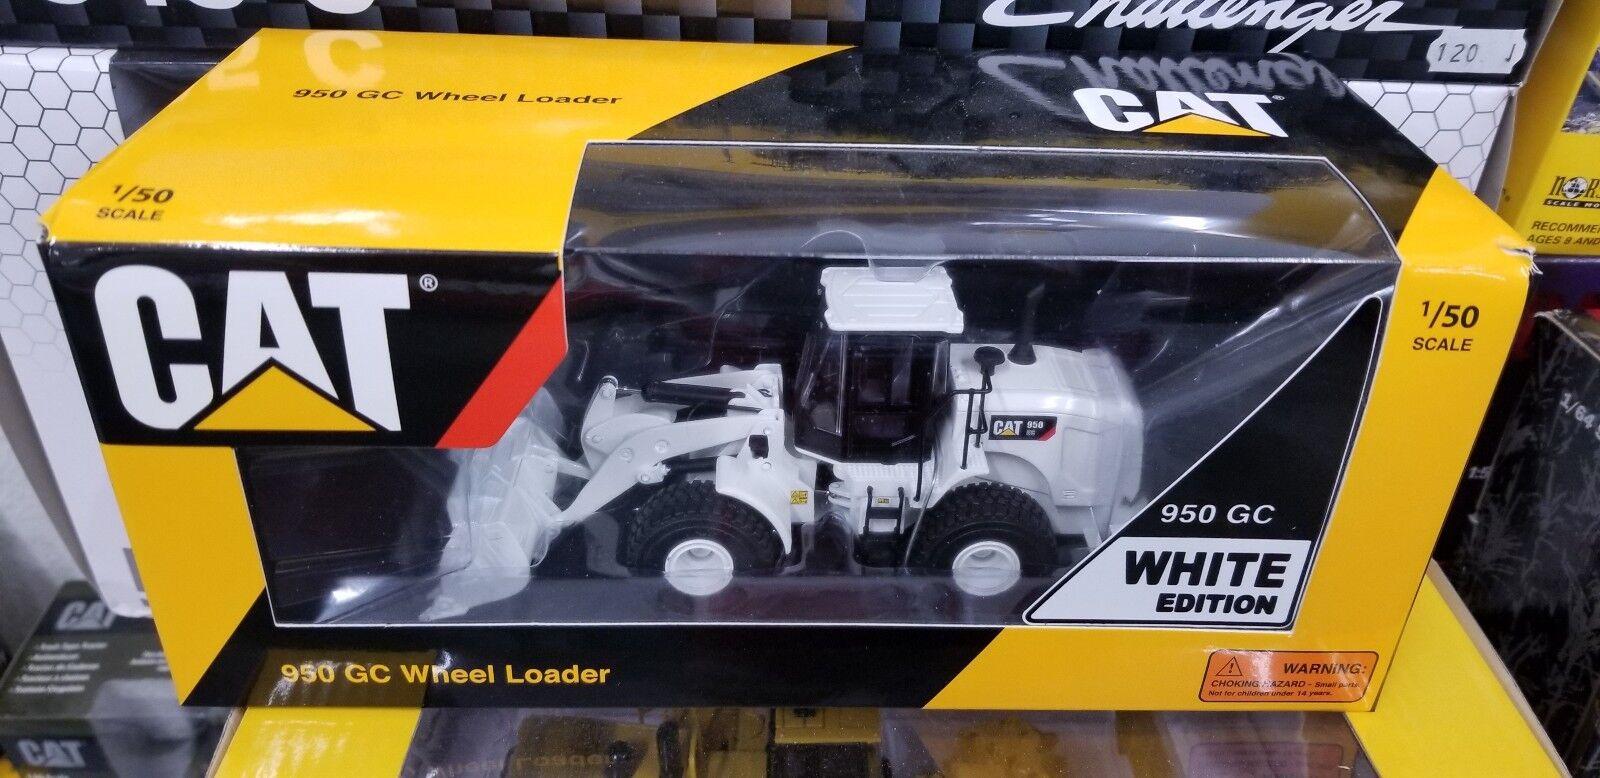 Tonkin 10010-02 1 50 Caterpillar 950 GC Wheel Loader in Mining White EDITION